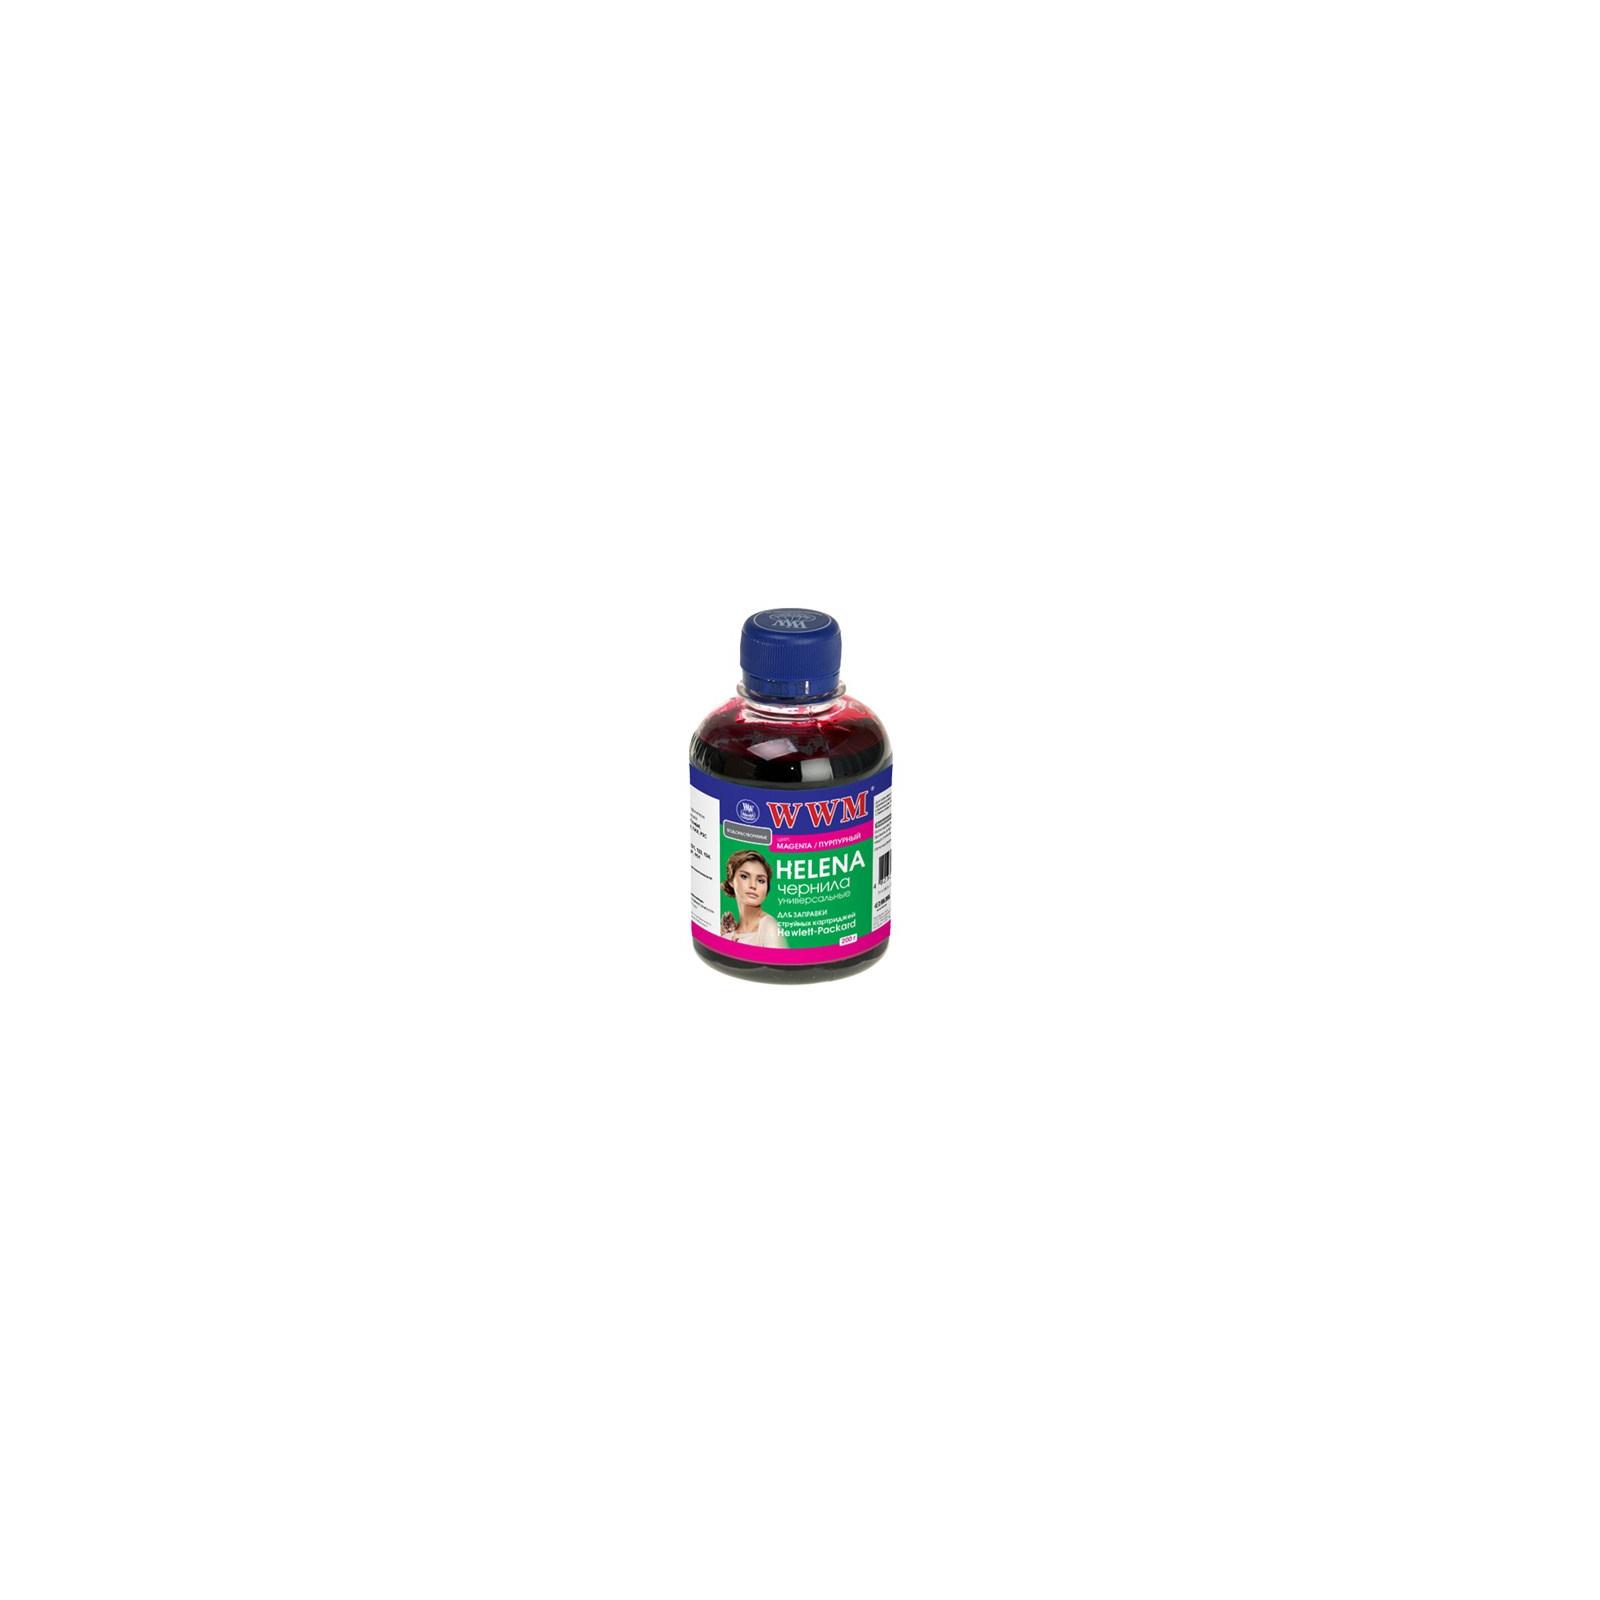 Чернила WWM HP UNIVERSAL HELENA Magenta (HU/M)